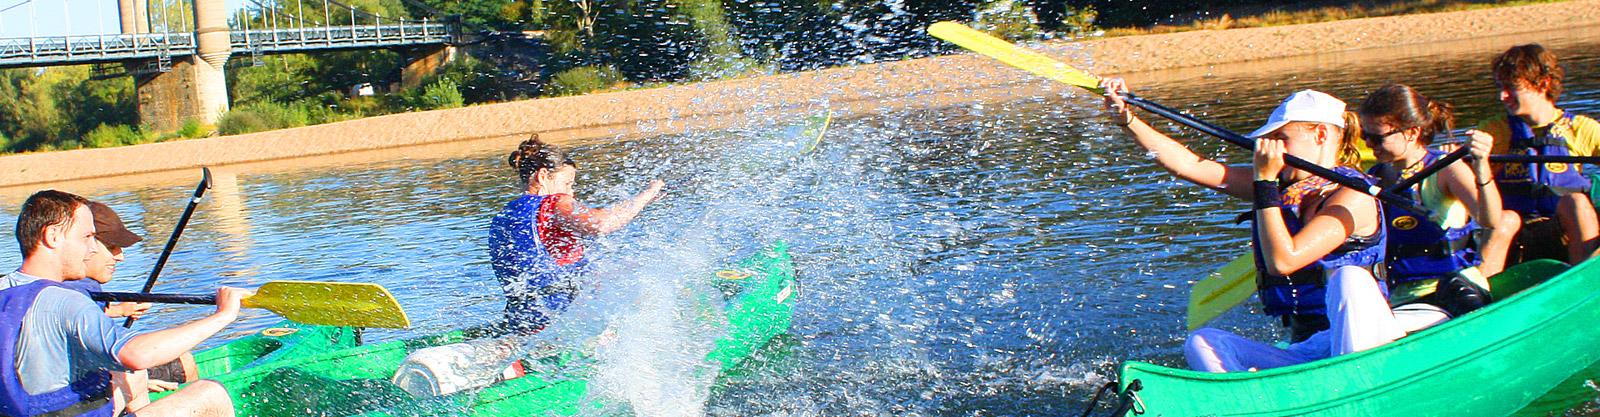 Canoës Kayaks : Adrénaline & oxygène